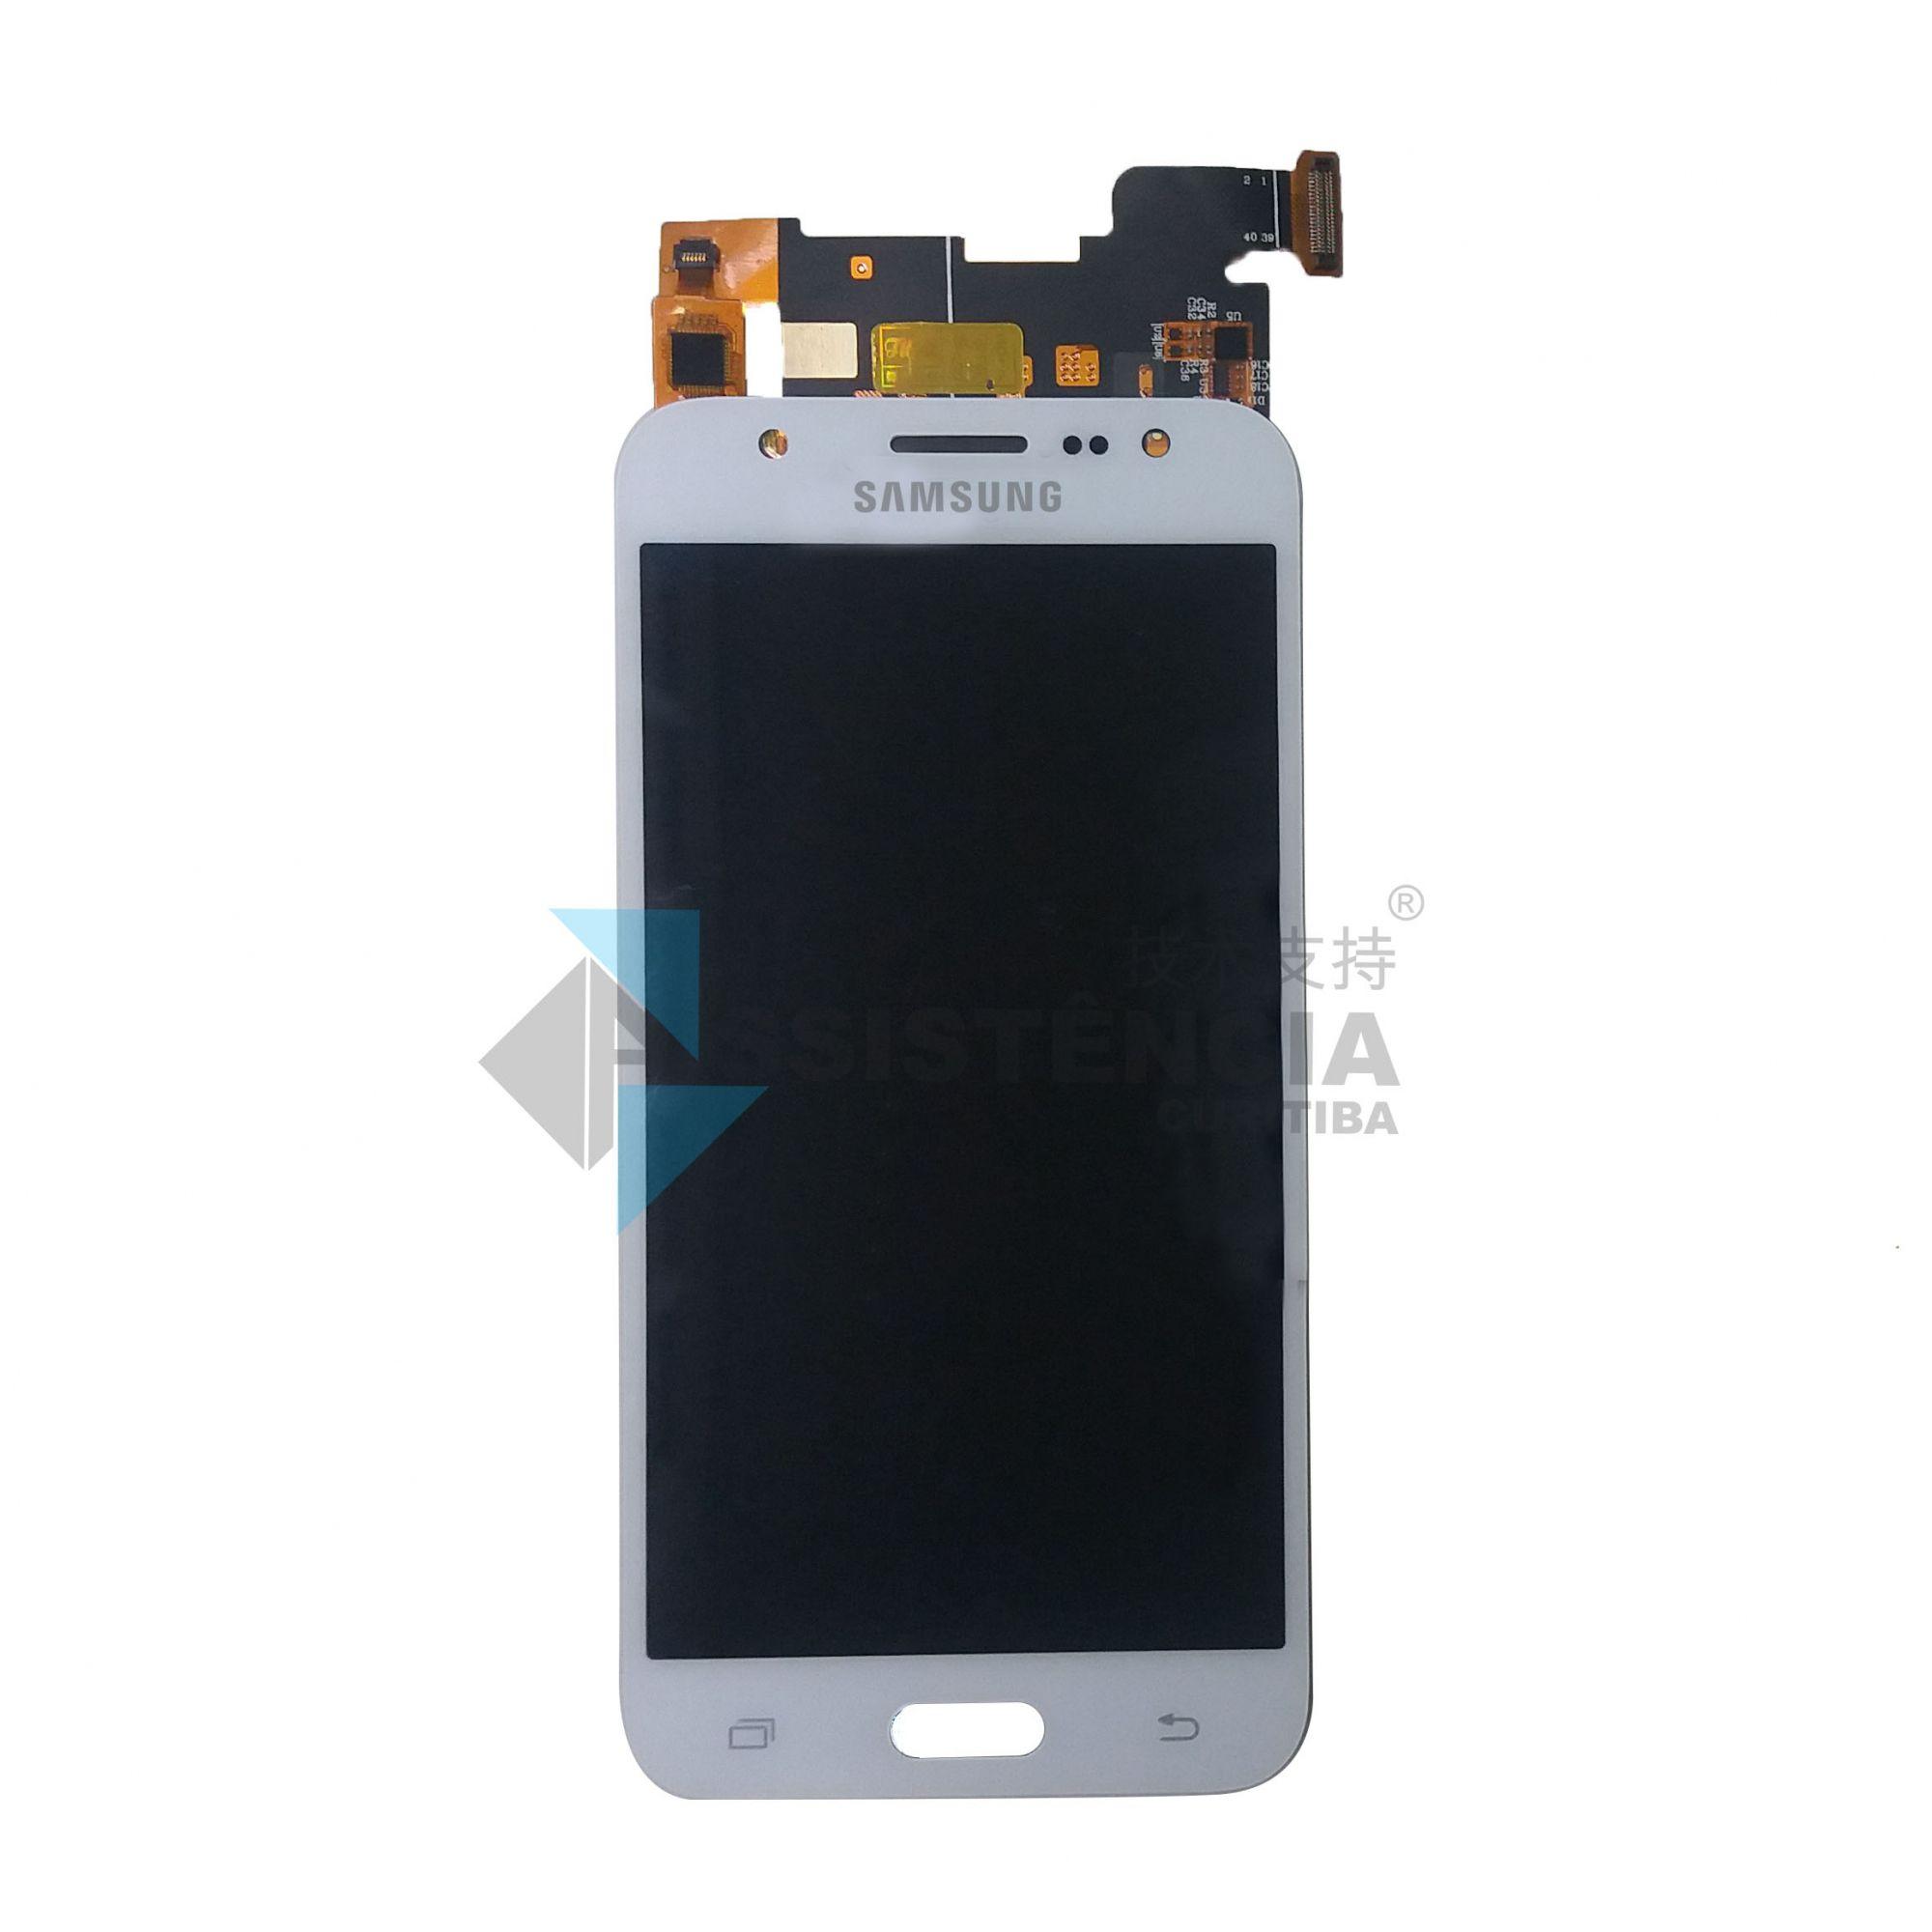 Tela Display Samsung Galaxy J5 J500 Sm-J500M/Ds Com Brilho Branco